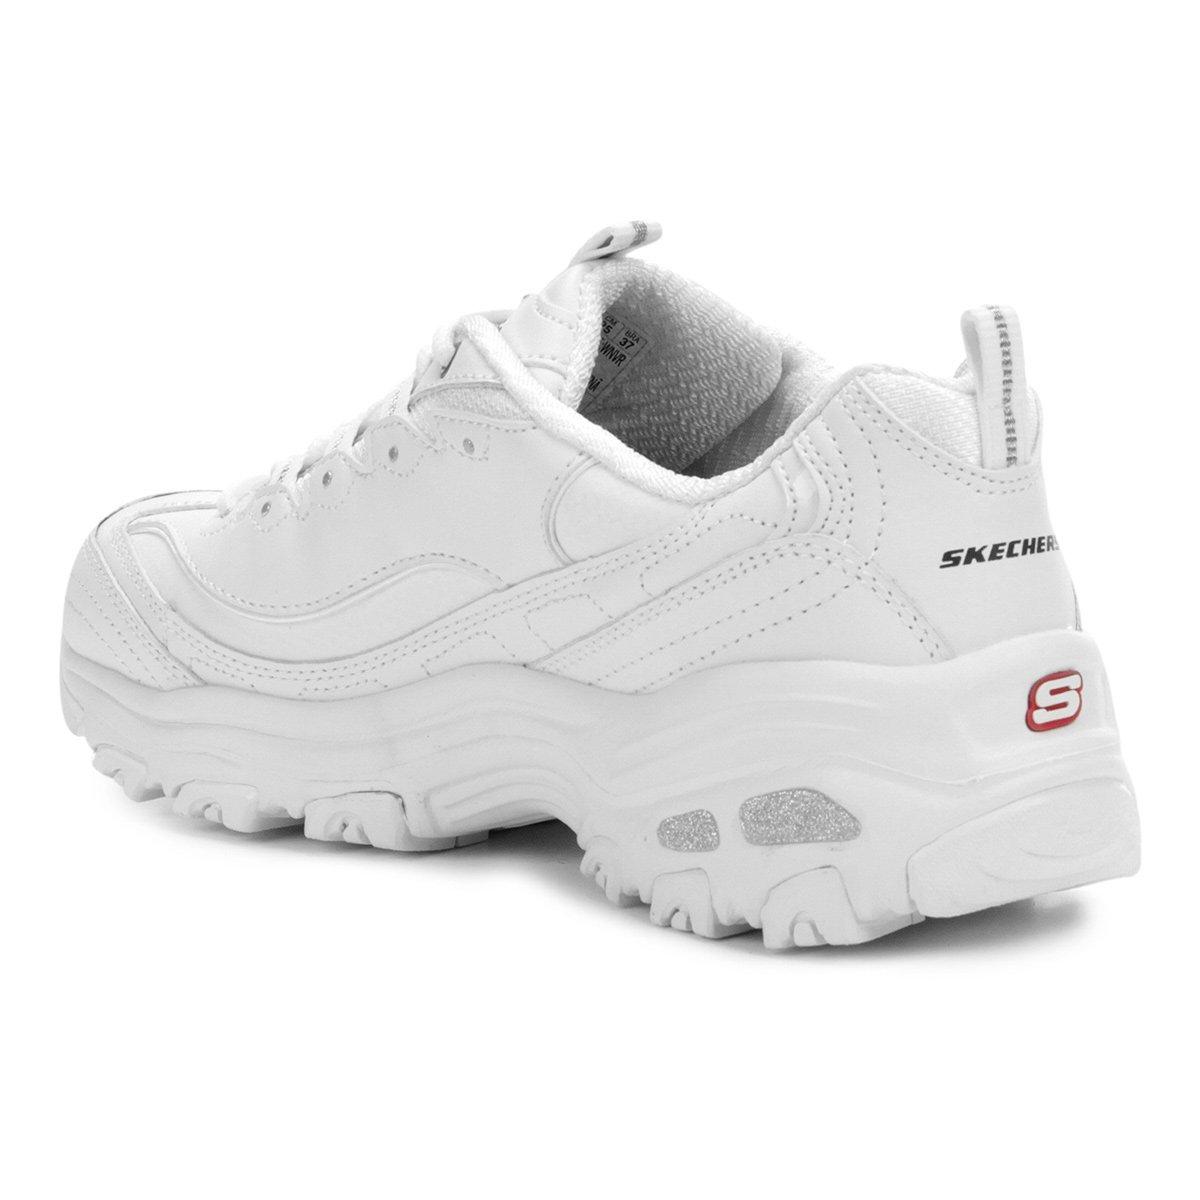 e1c072c9bfa16e Tênis Skechers D'Lites Fresh Start Feminino - Tam: 37 - Shopping ...